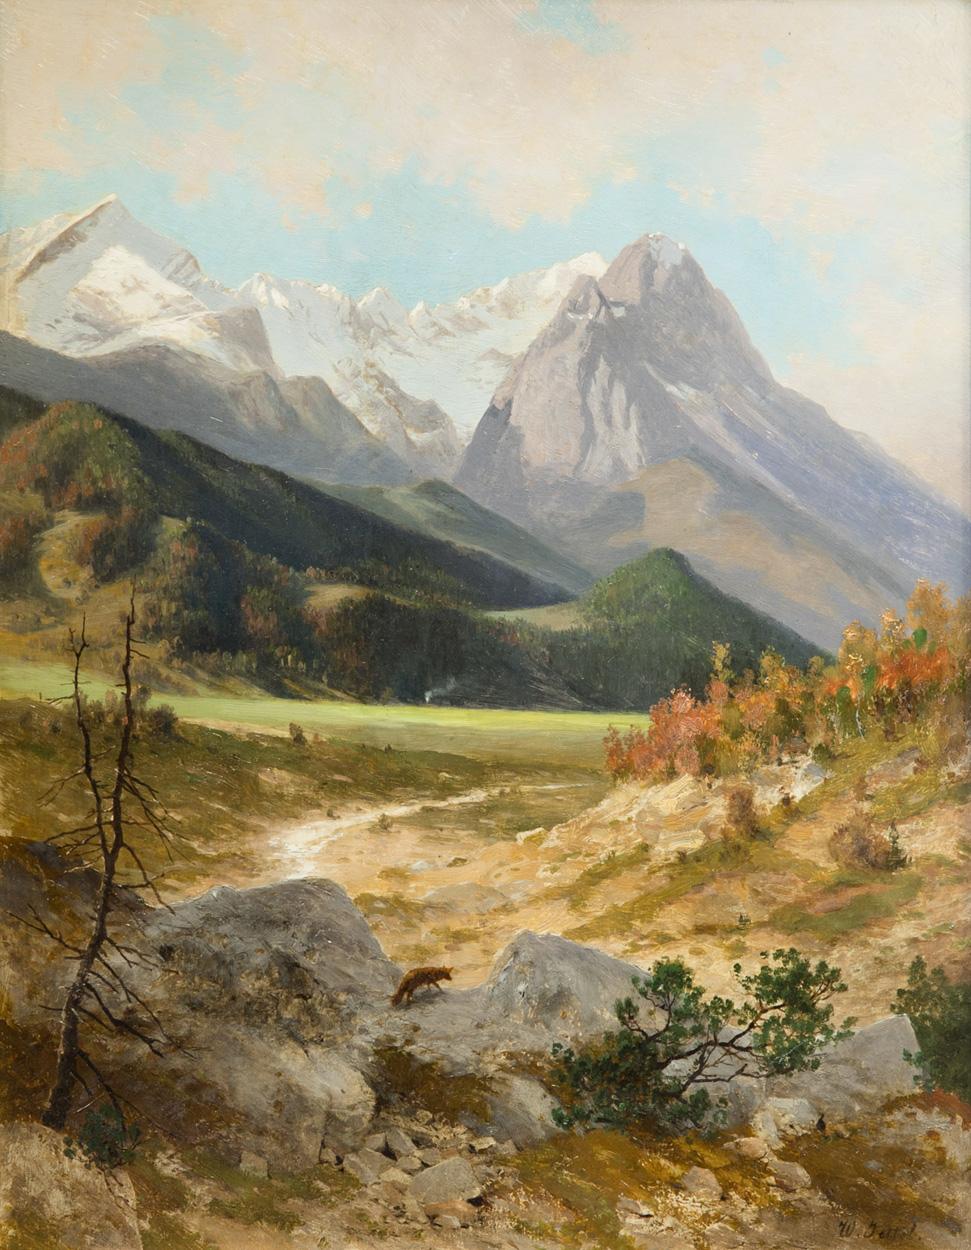 Wladimir Jettel, Alpenlandschaft